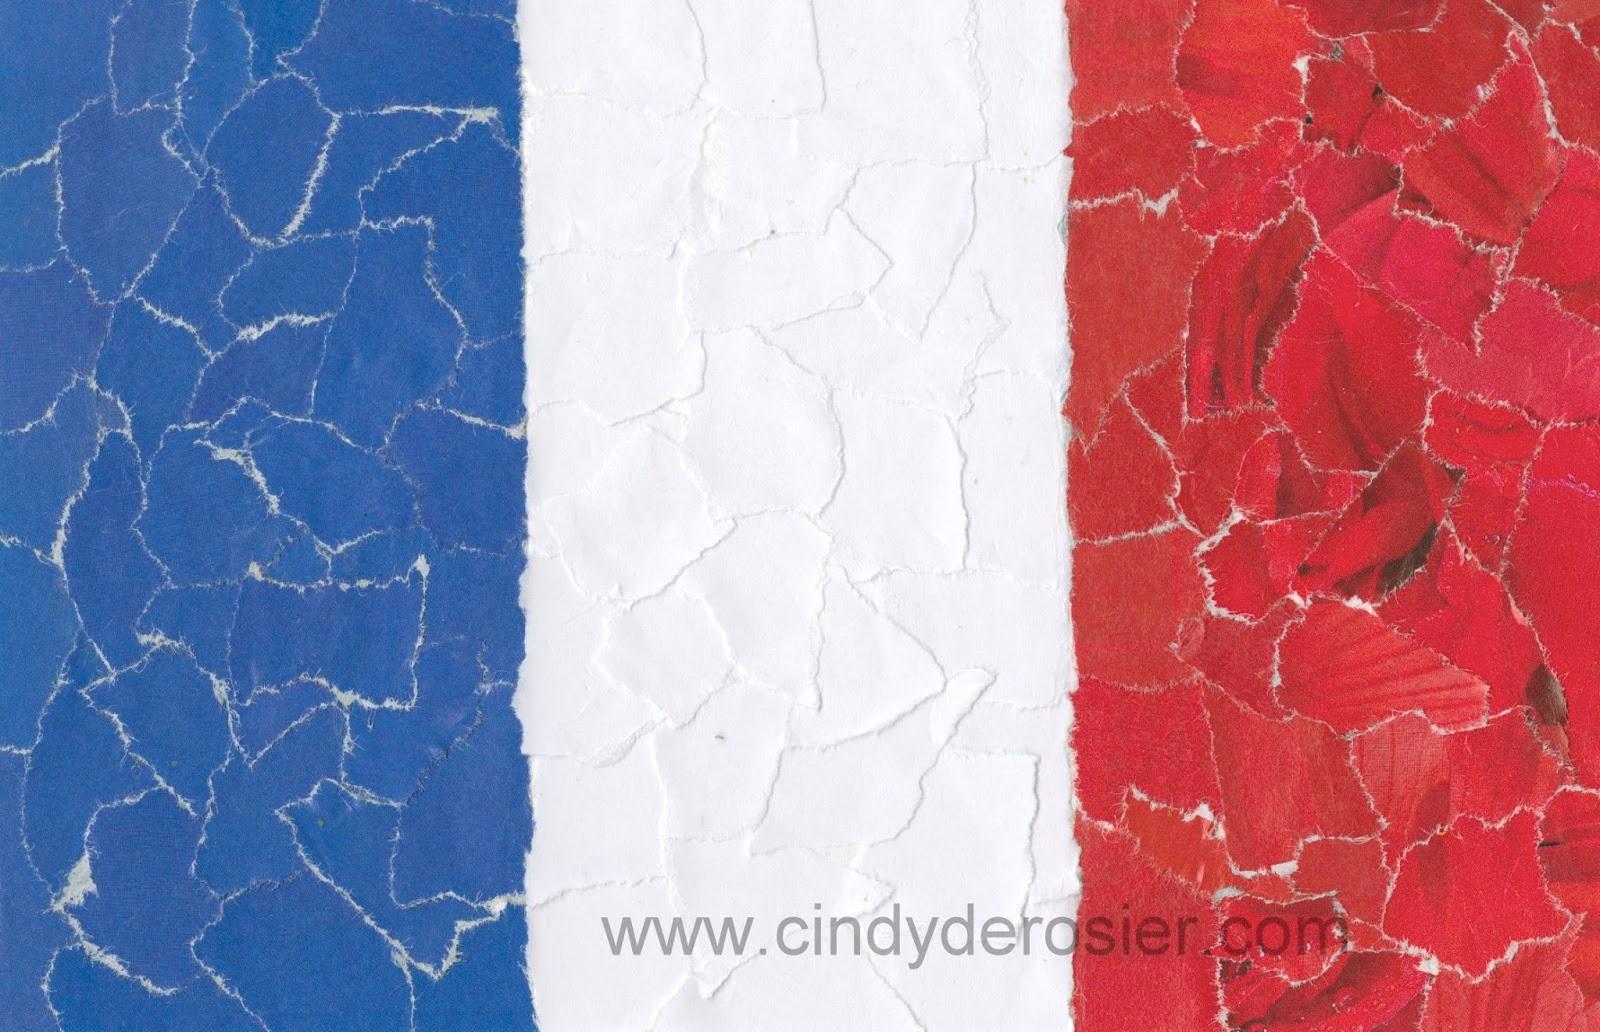 cindy derosier my creative life french tricolor mosaic